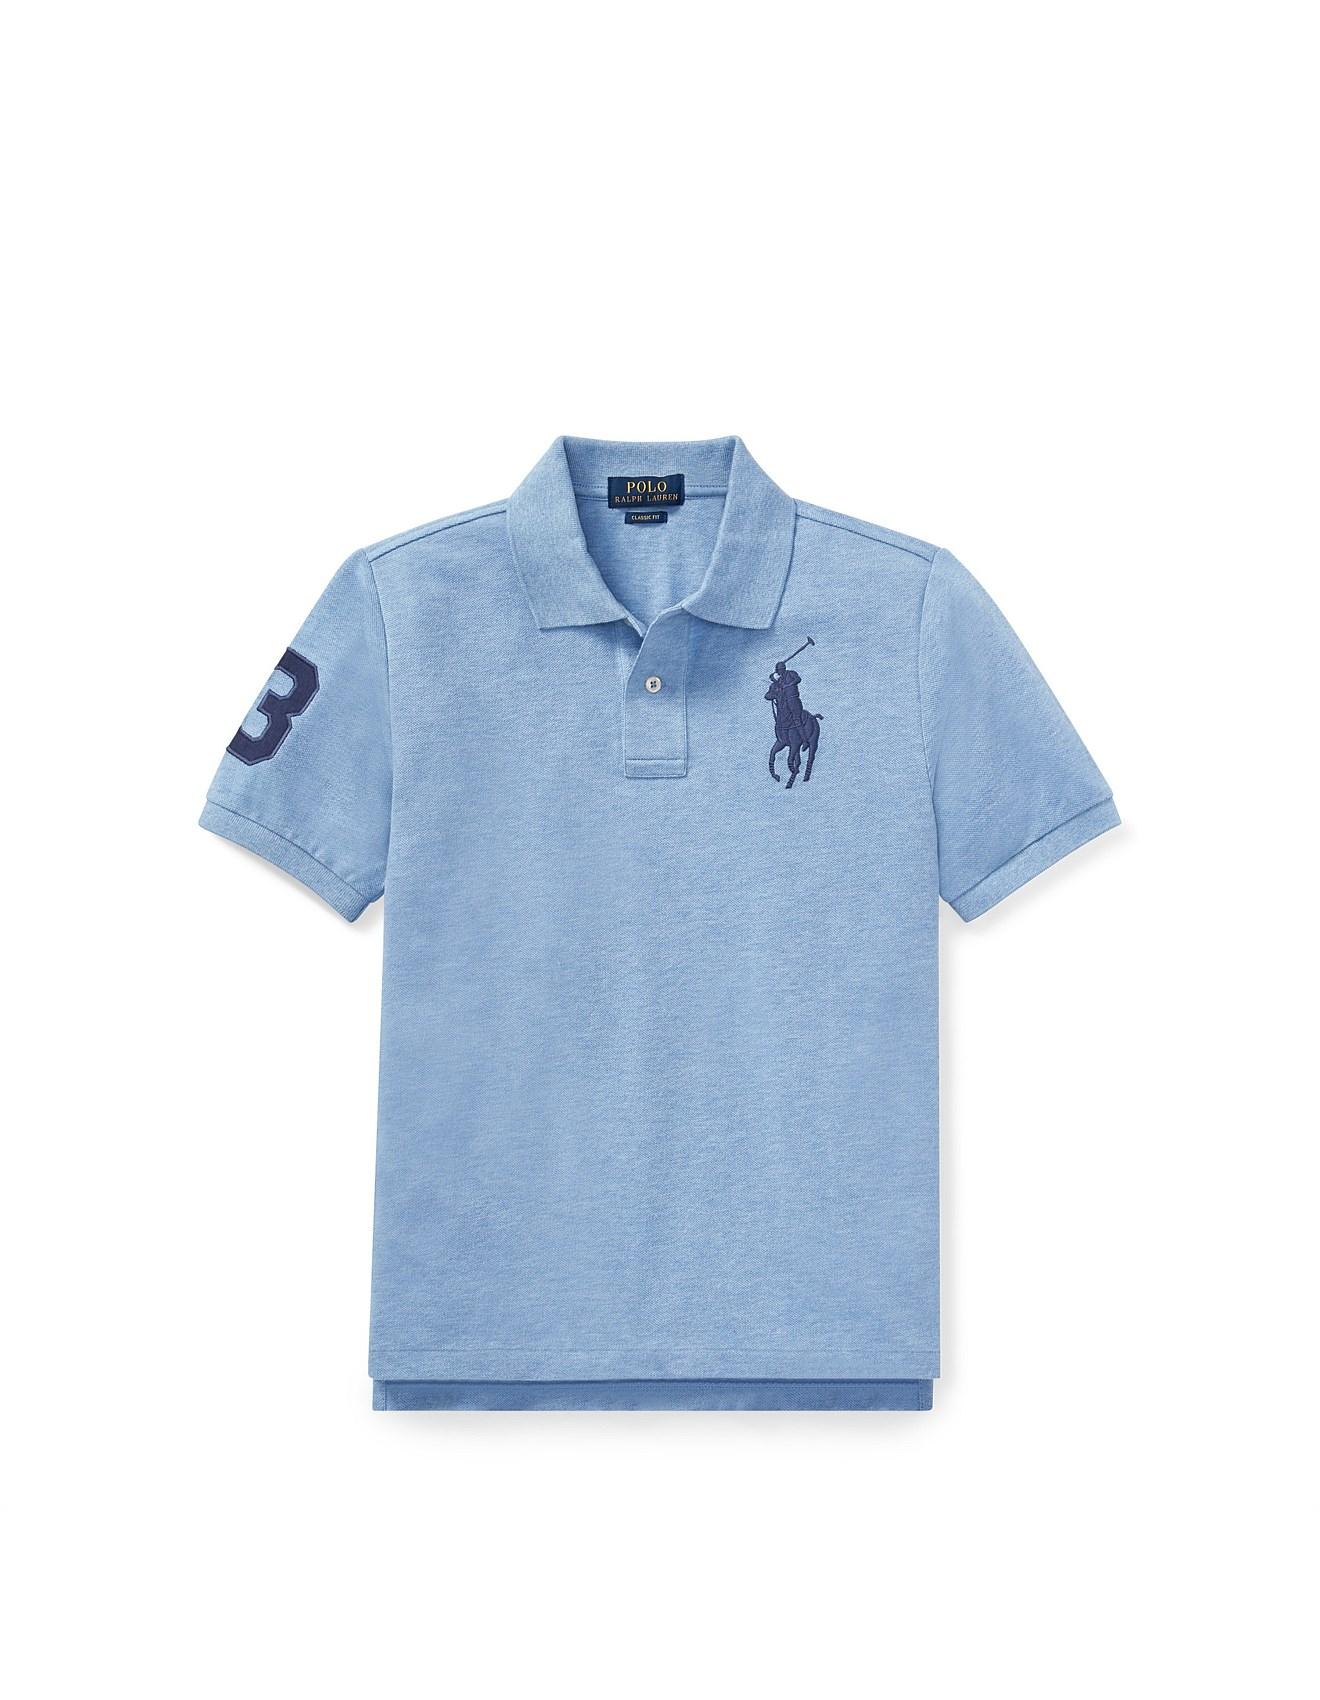 b118ce20 Kid's Clothing | New In Boys, Girls & Baby Clothes | David Jones ...